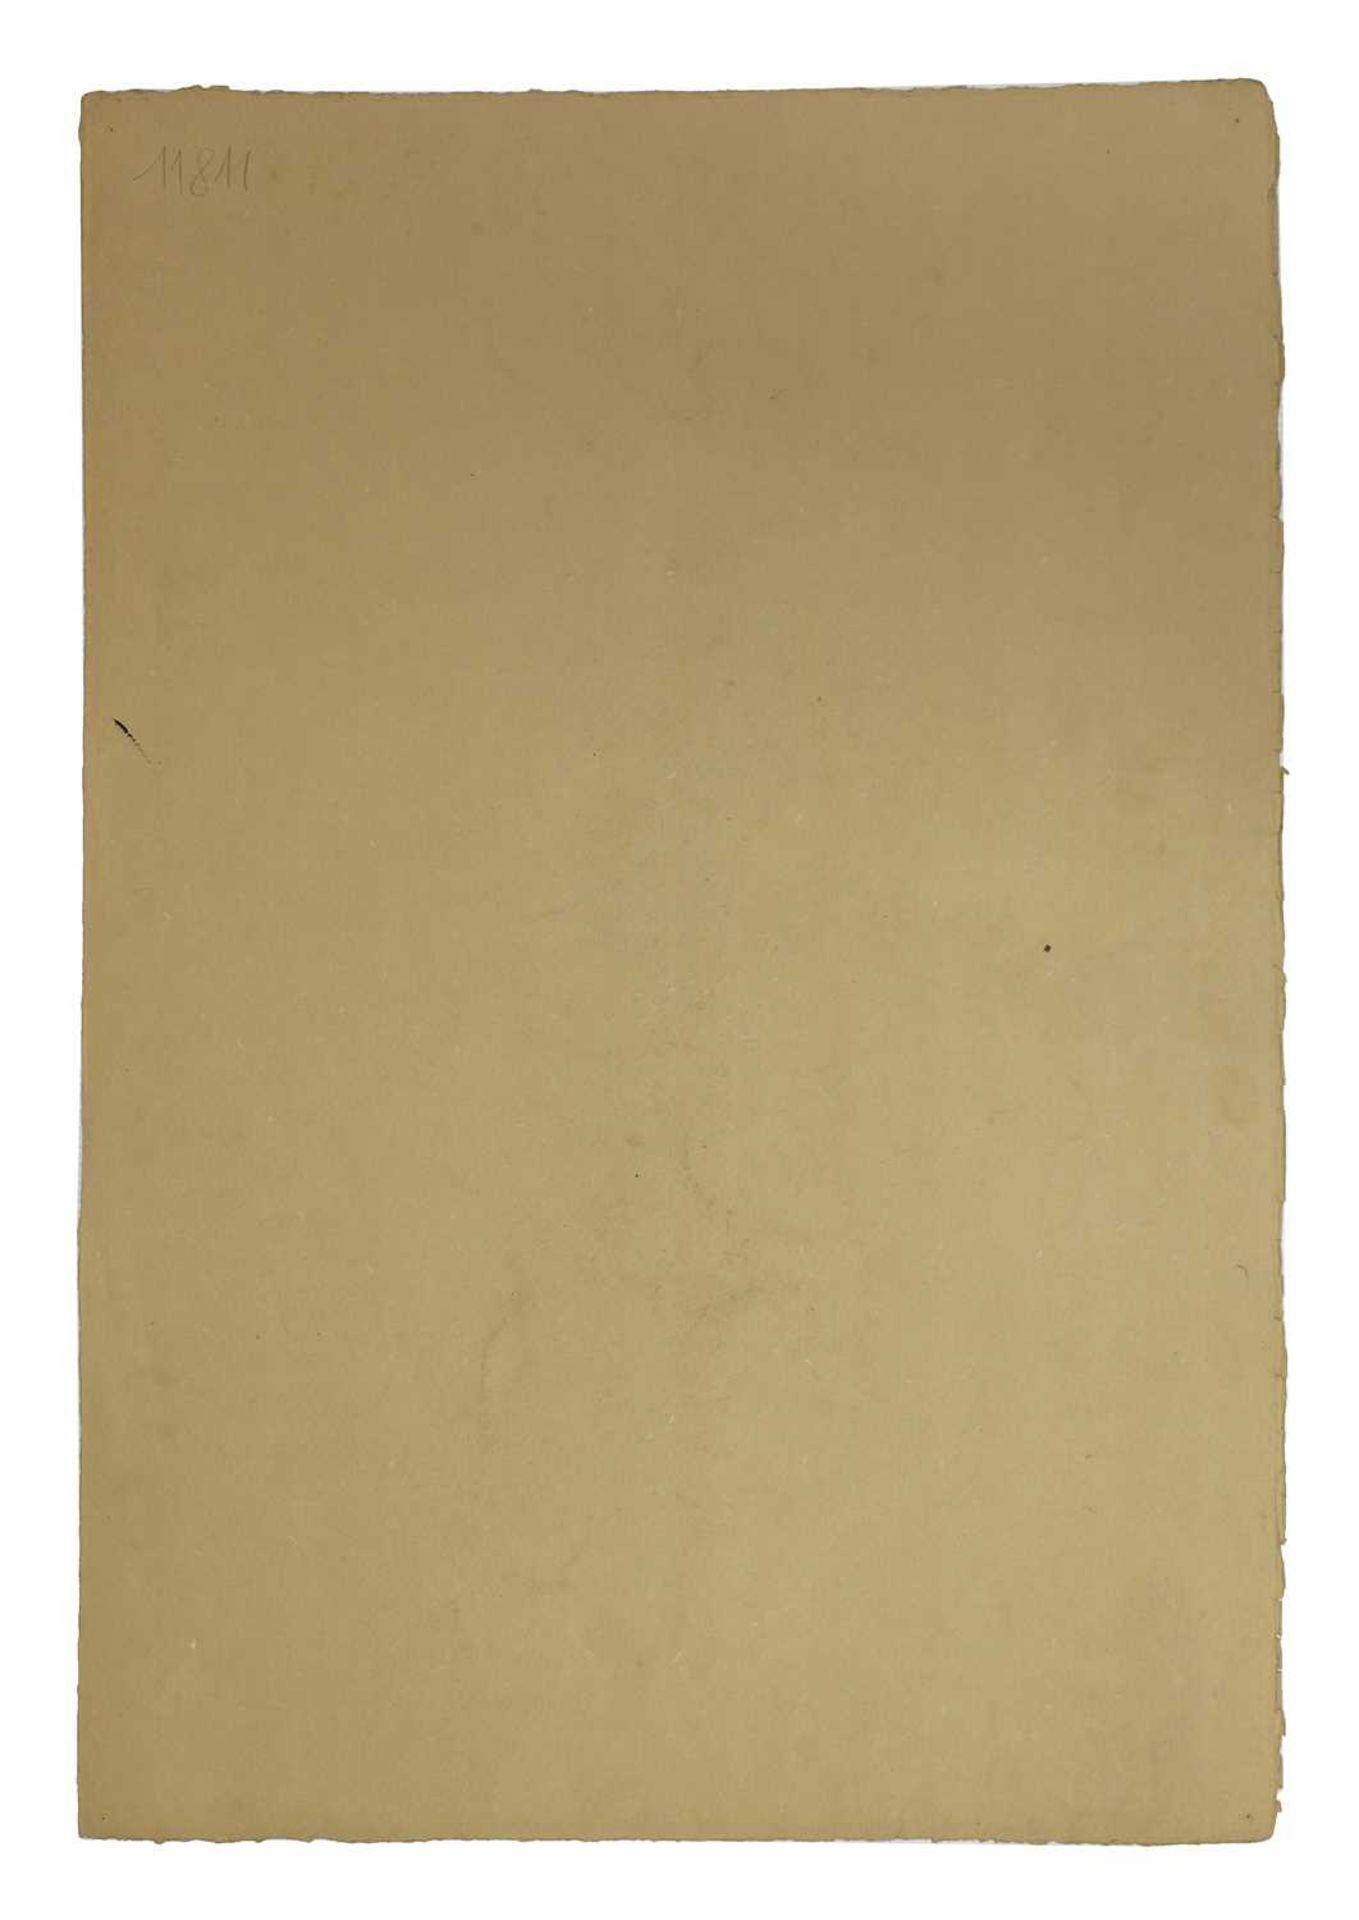 *John Guida (Italian, 1897-1965) - Image 2 of 2